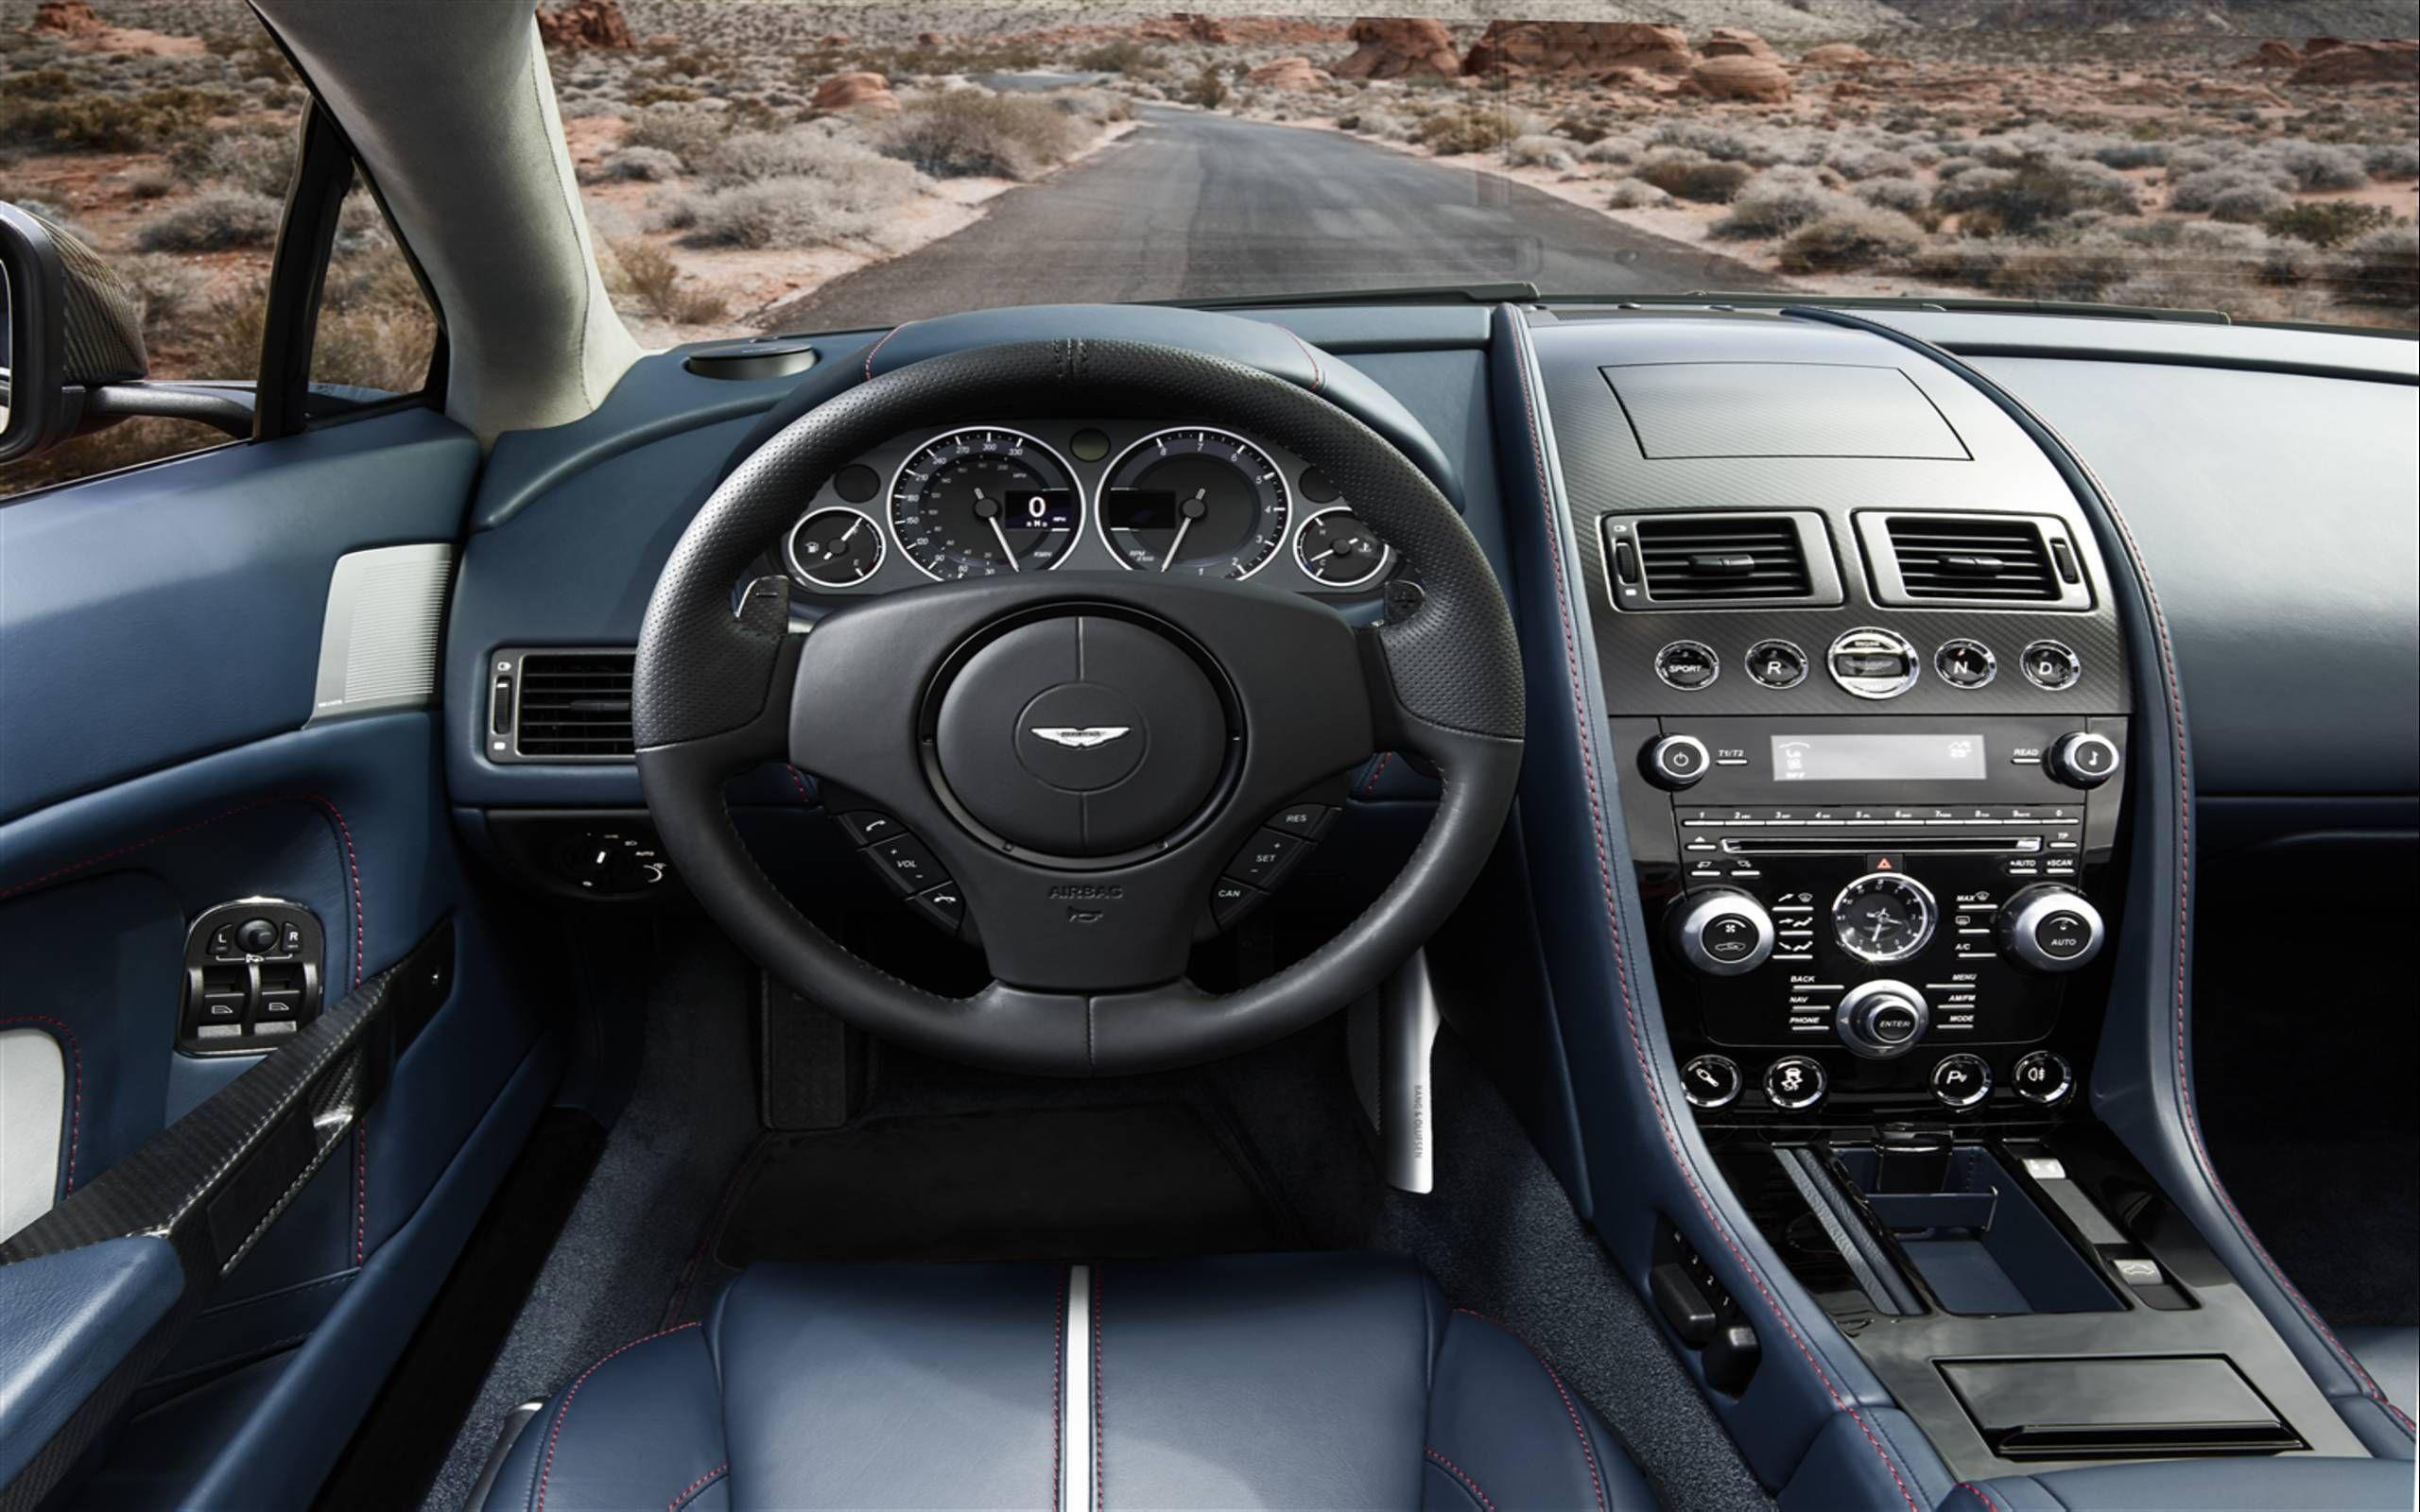 2015 Aston Martin V12 Vantage S Roadster First Drive